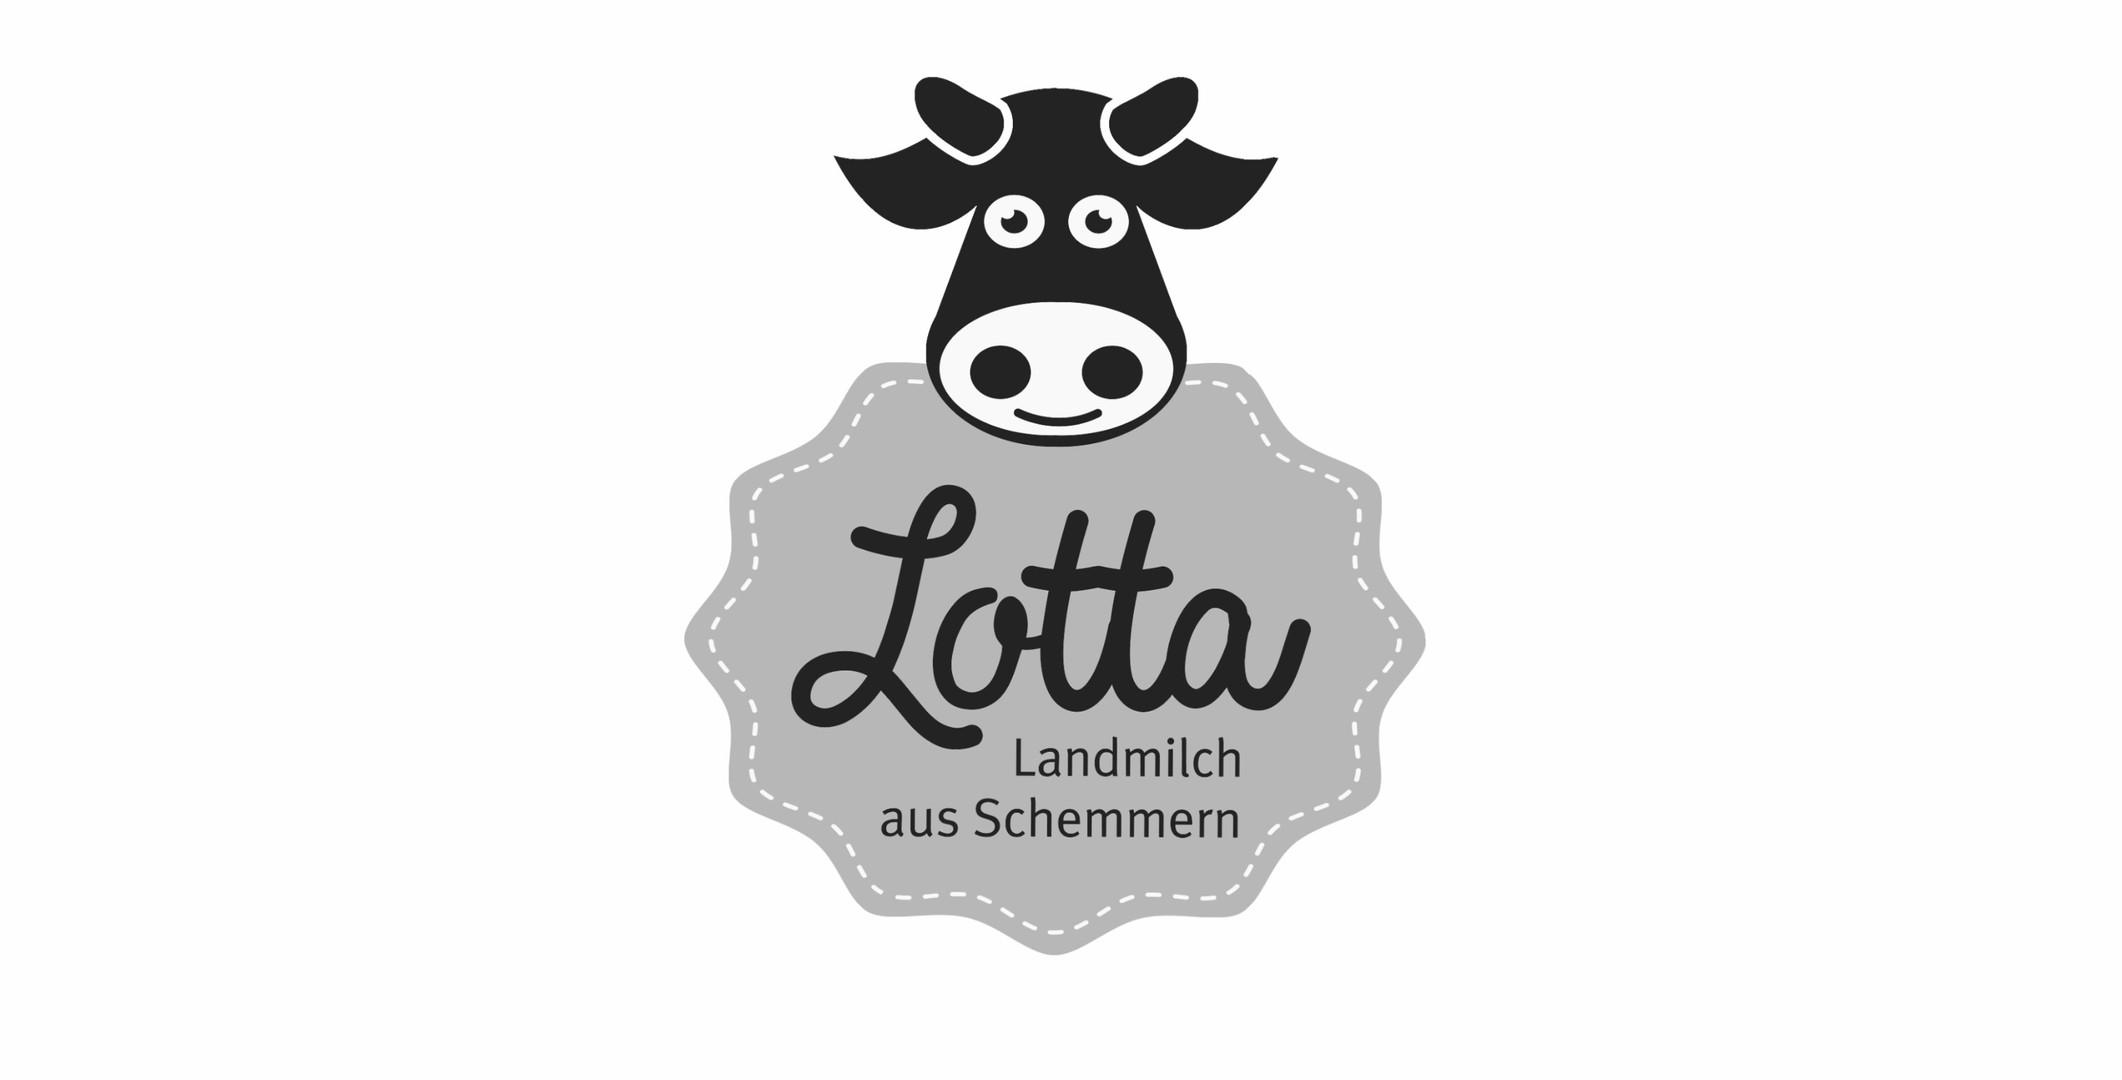 Lotta-Landmilch_edited.jpg